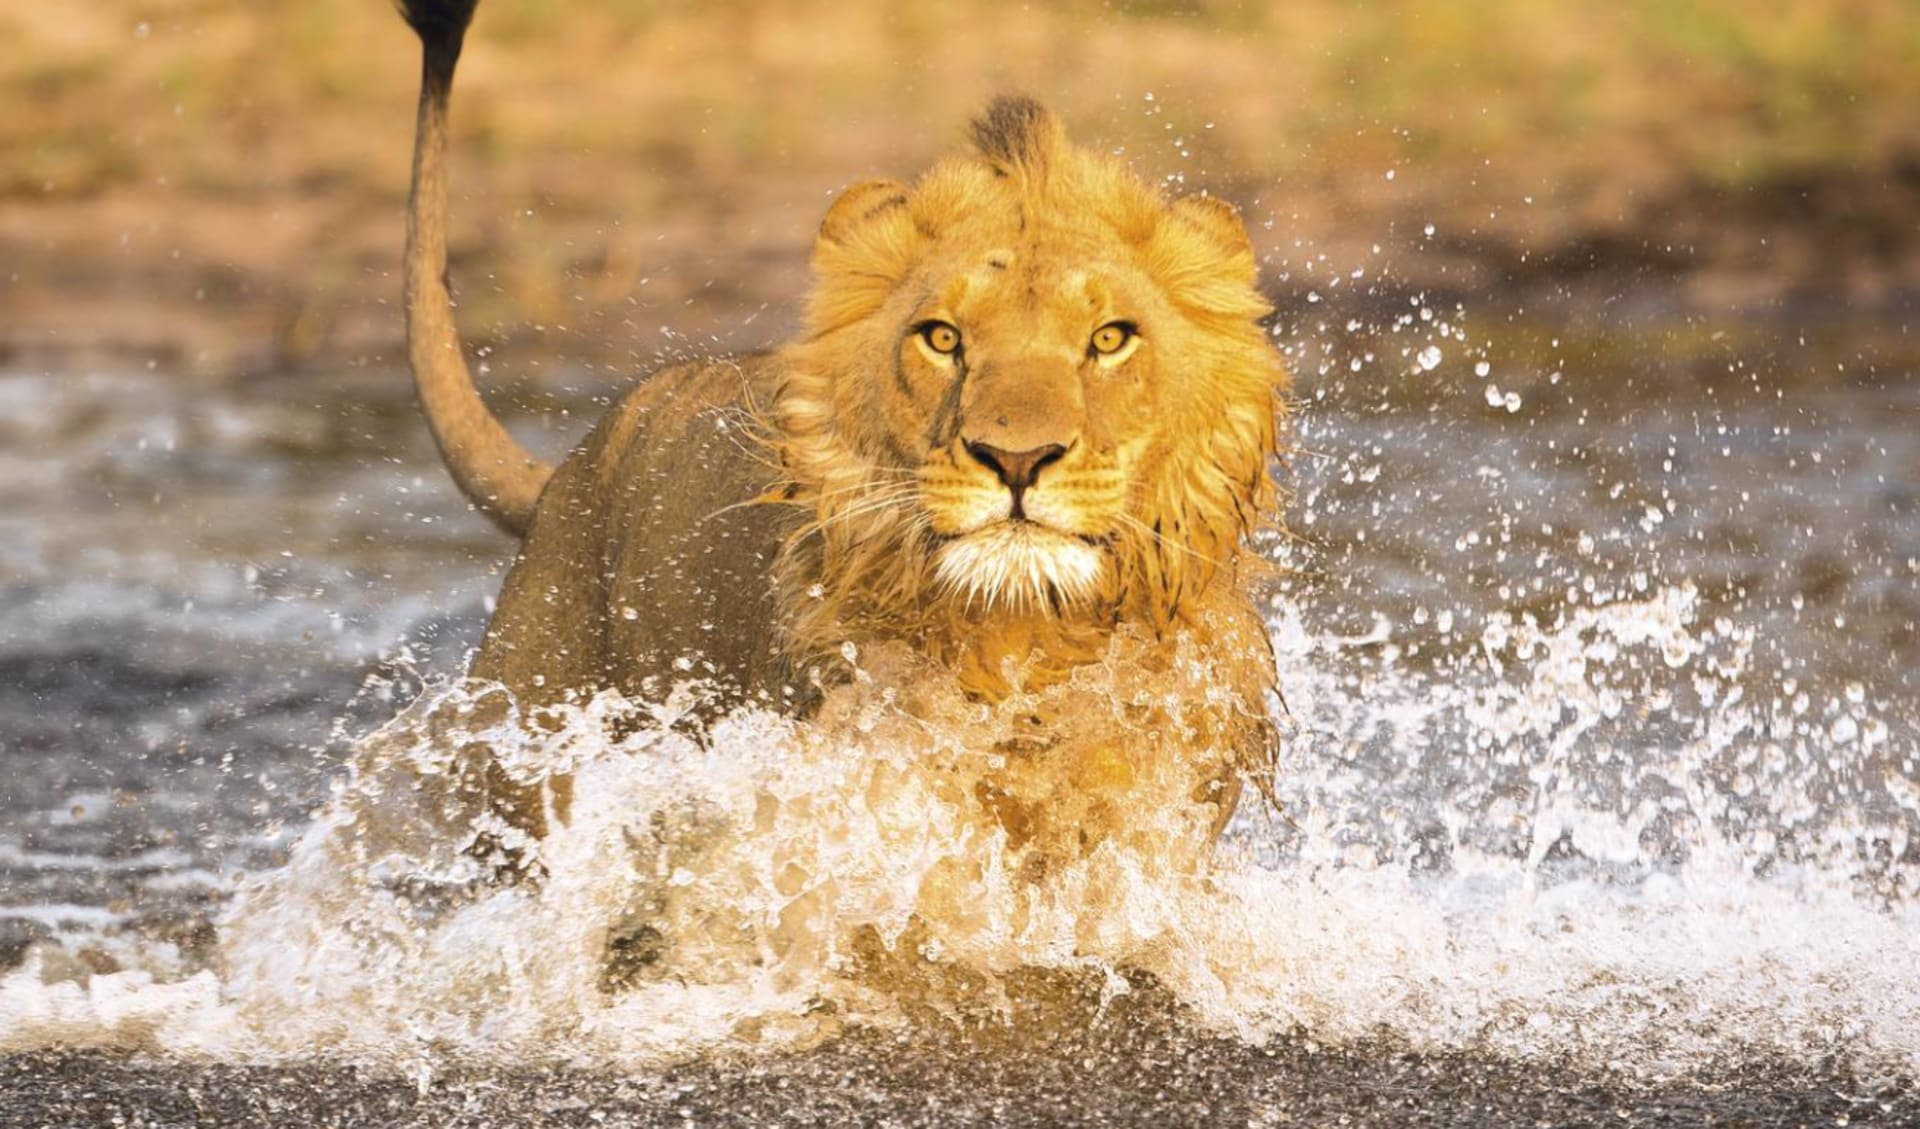 Botswana Royal ab Linyanti Region: Botswana - Okavango Delta - Löwe im Wasser